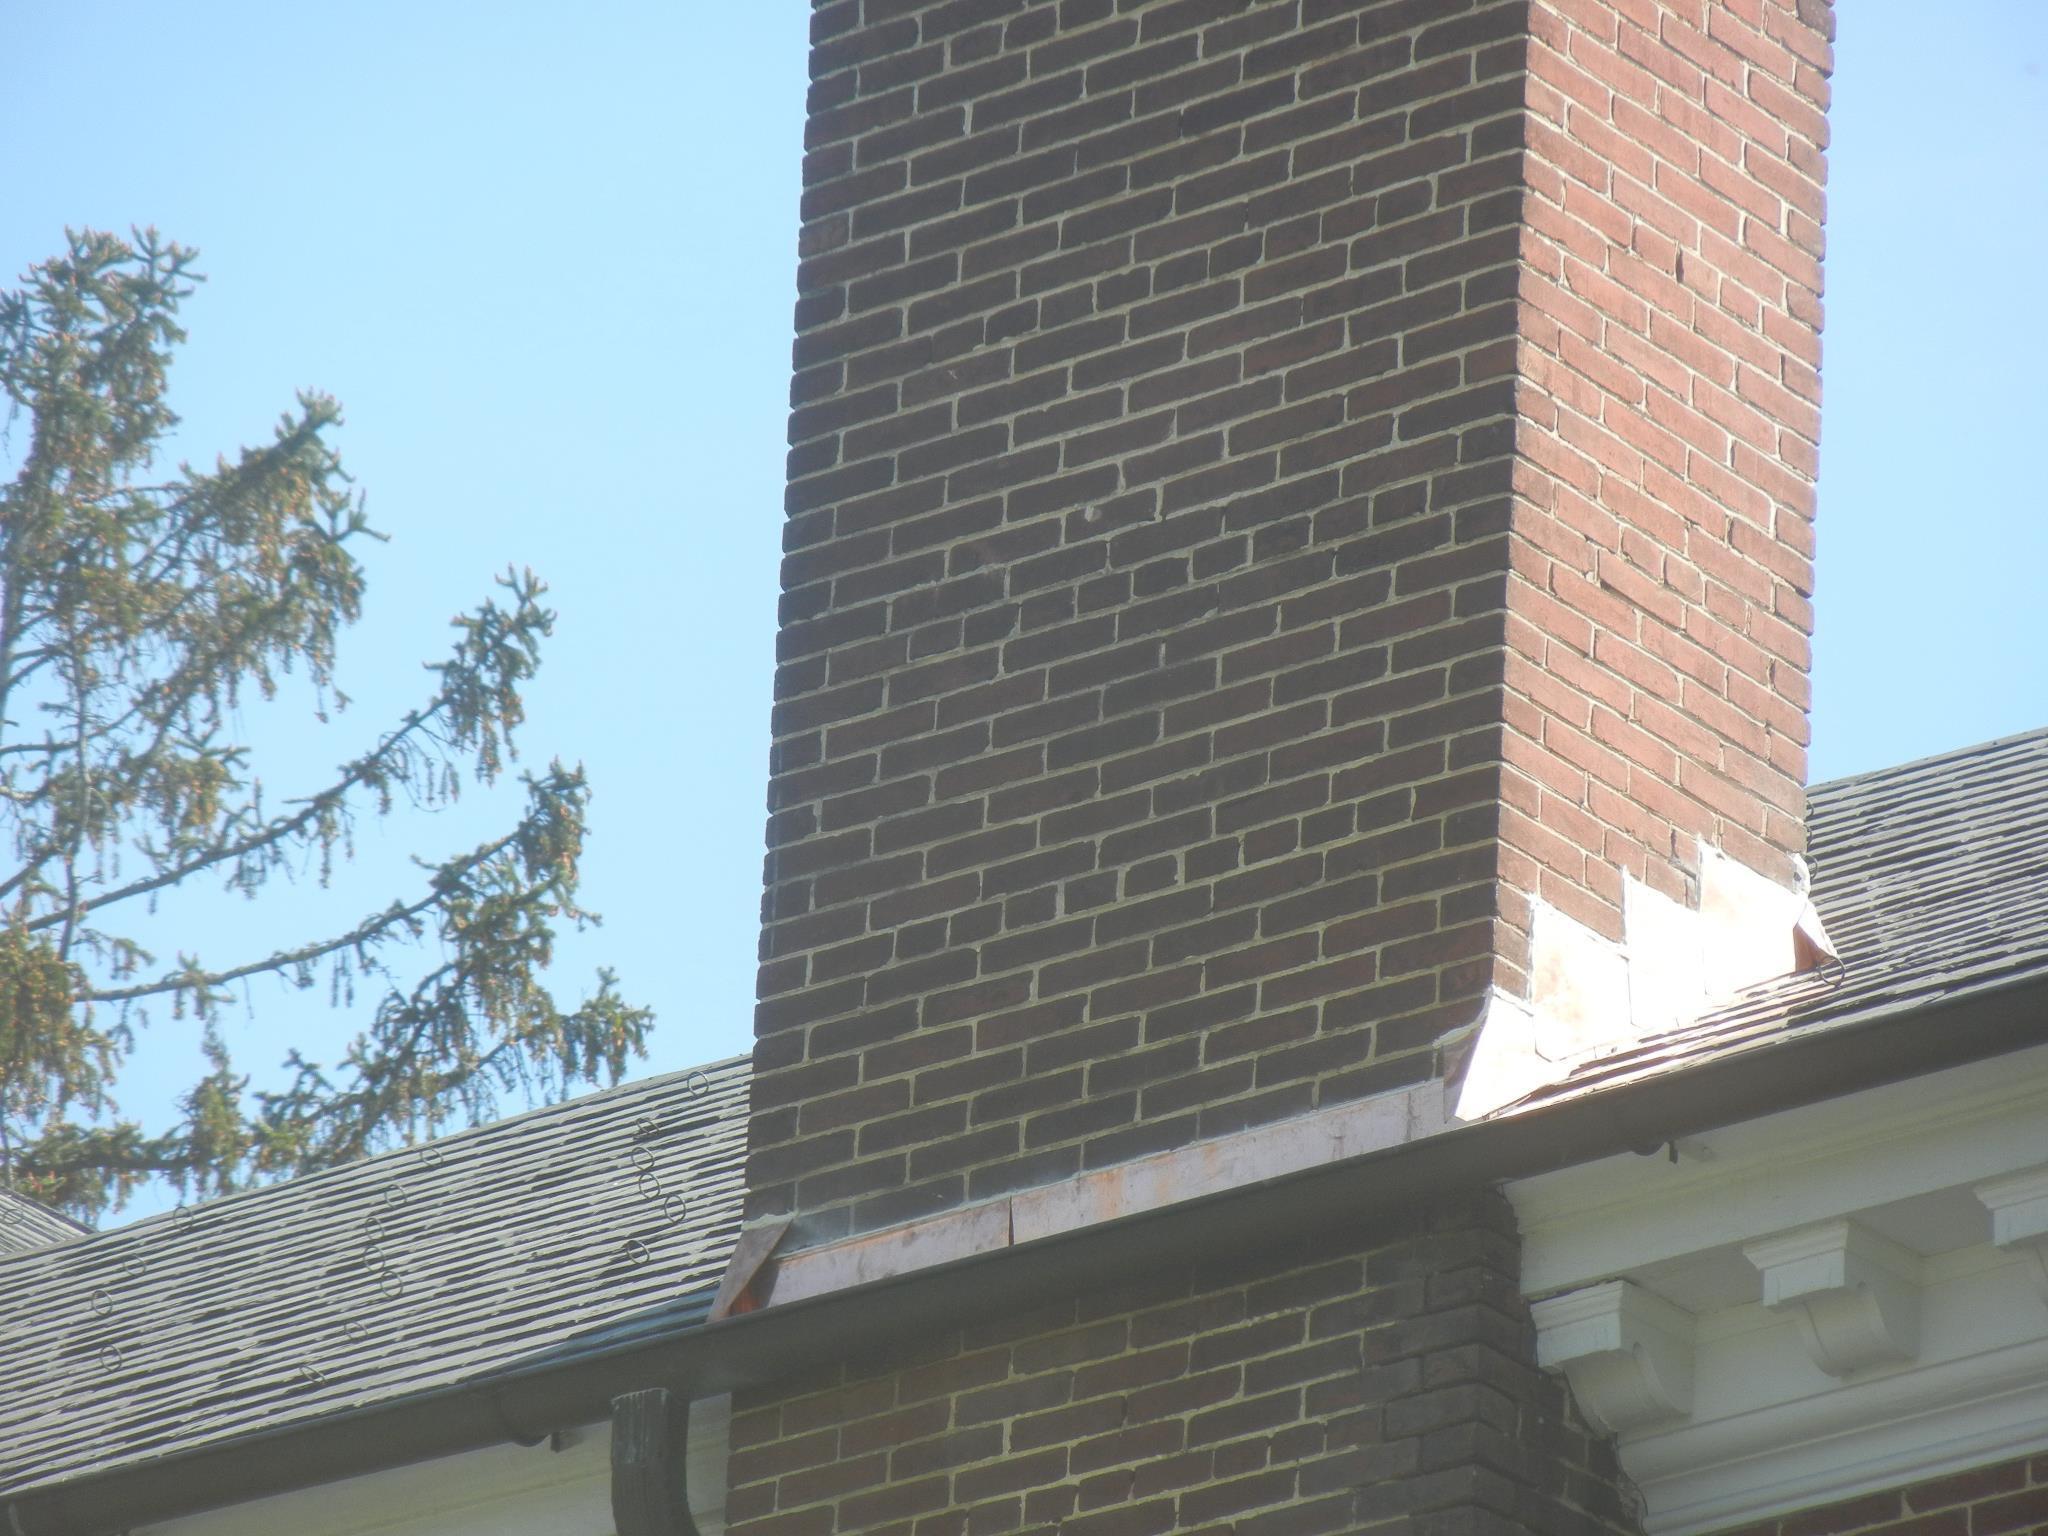 Joey Wildasin Slate Roofing image 23